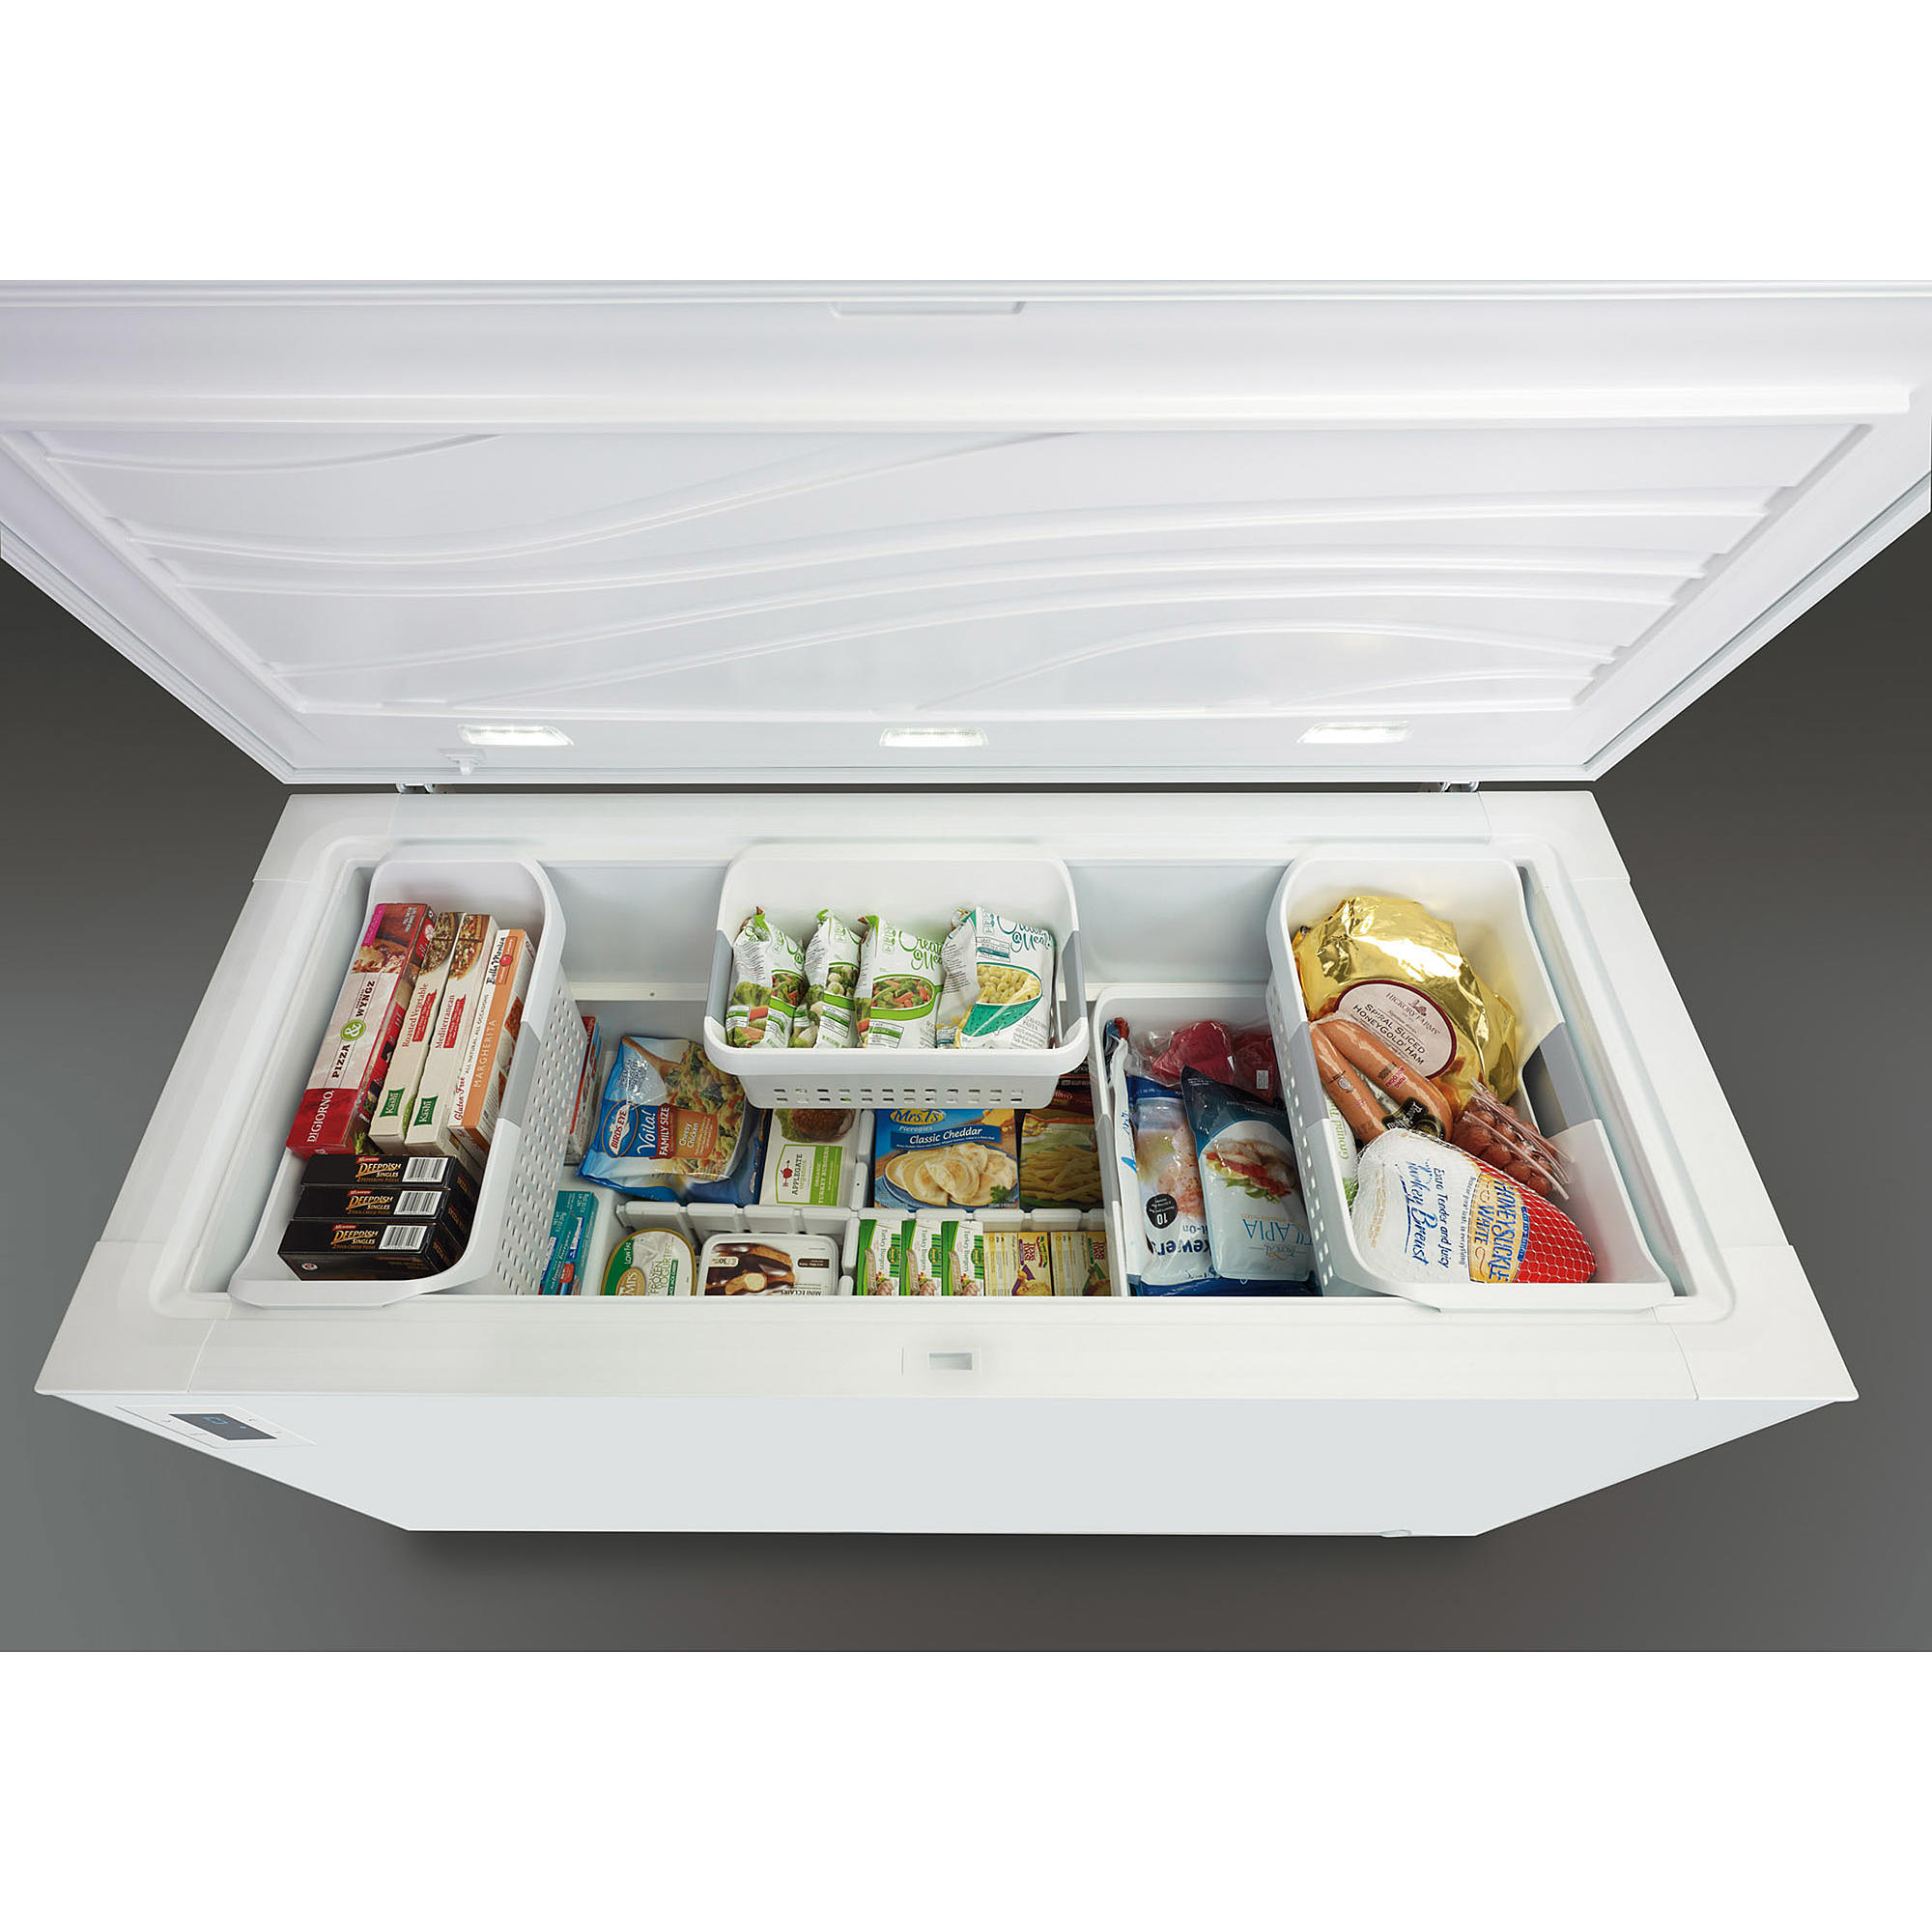 Common freezer problems - too warm   Symptom diagnosis